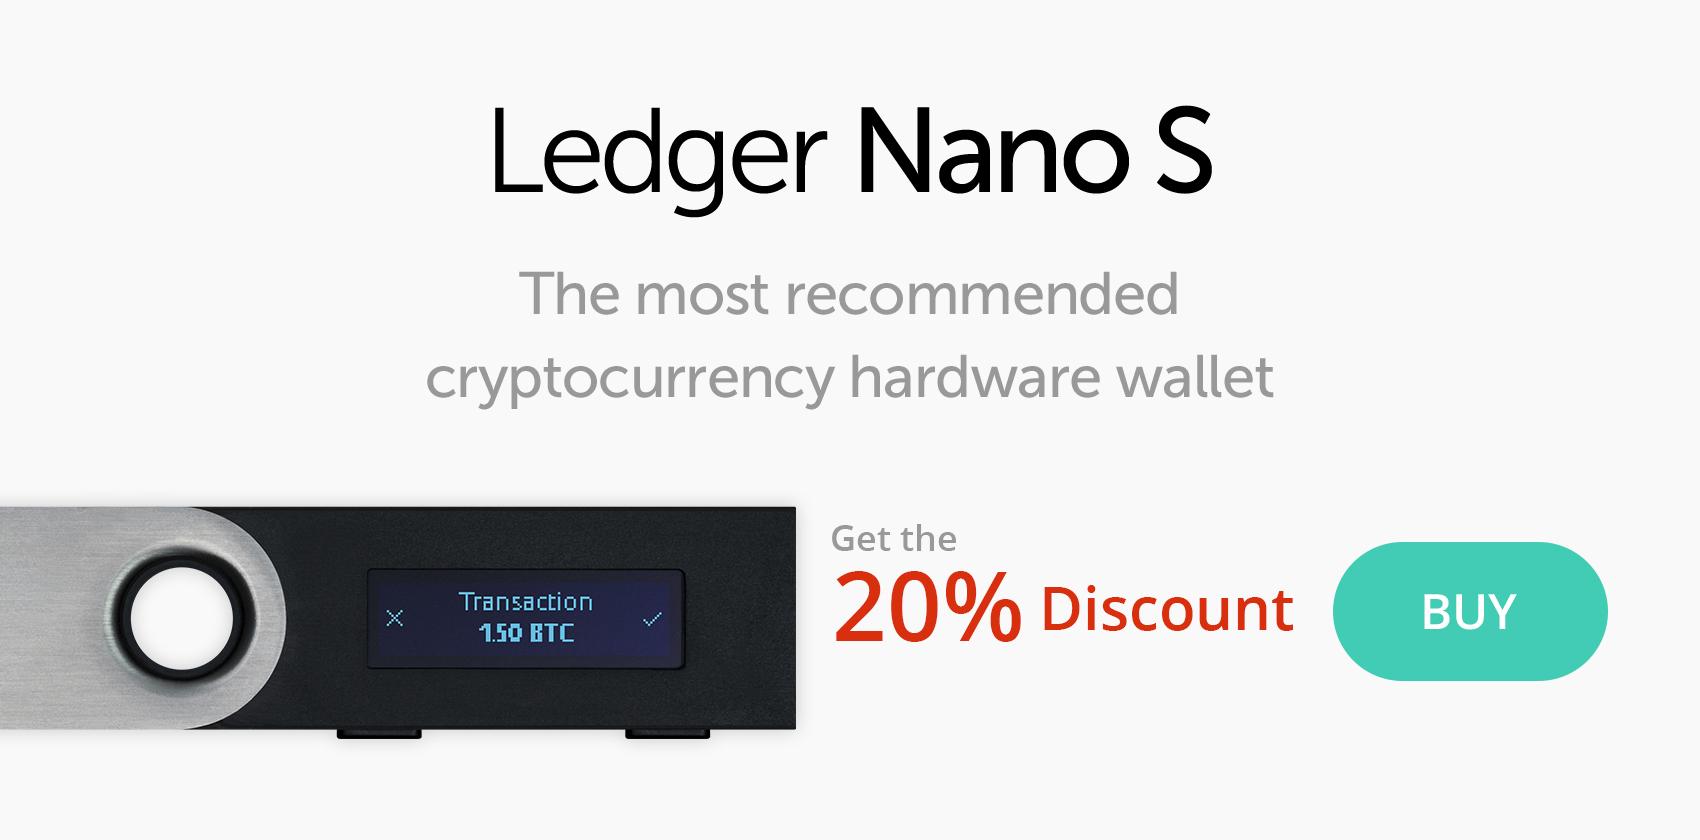 ledger nano s cryptocurrency hardware wallet uk